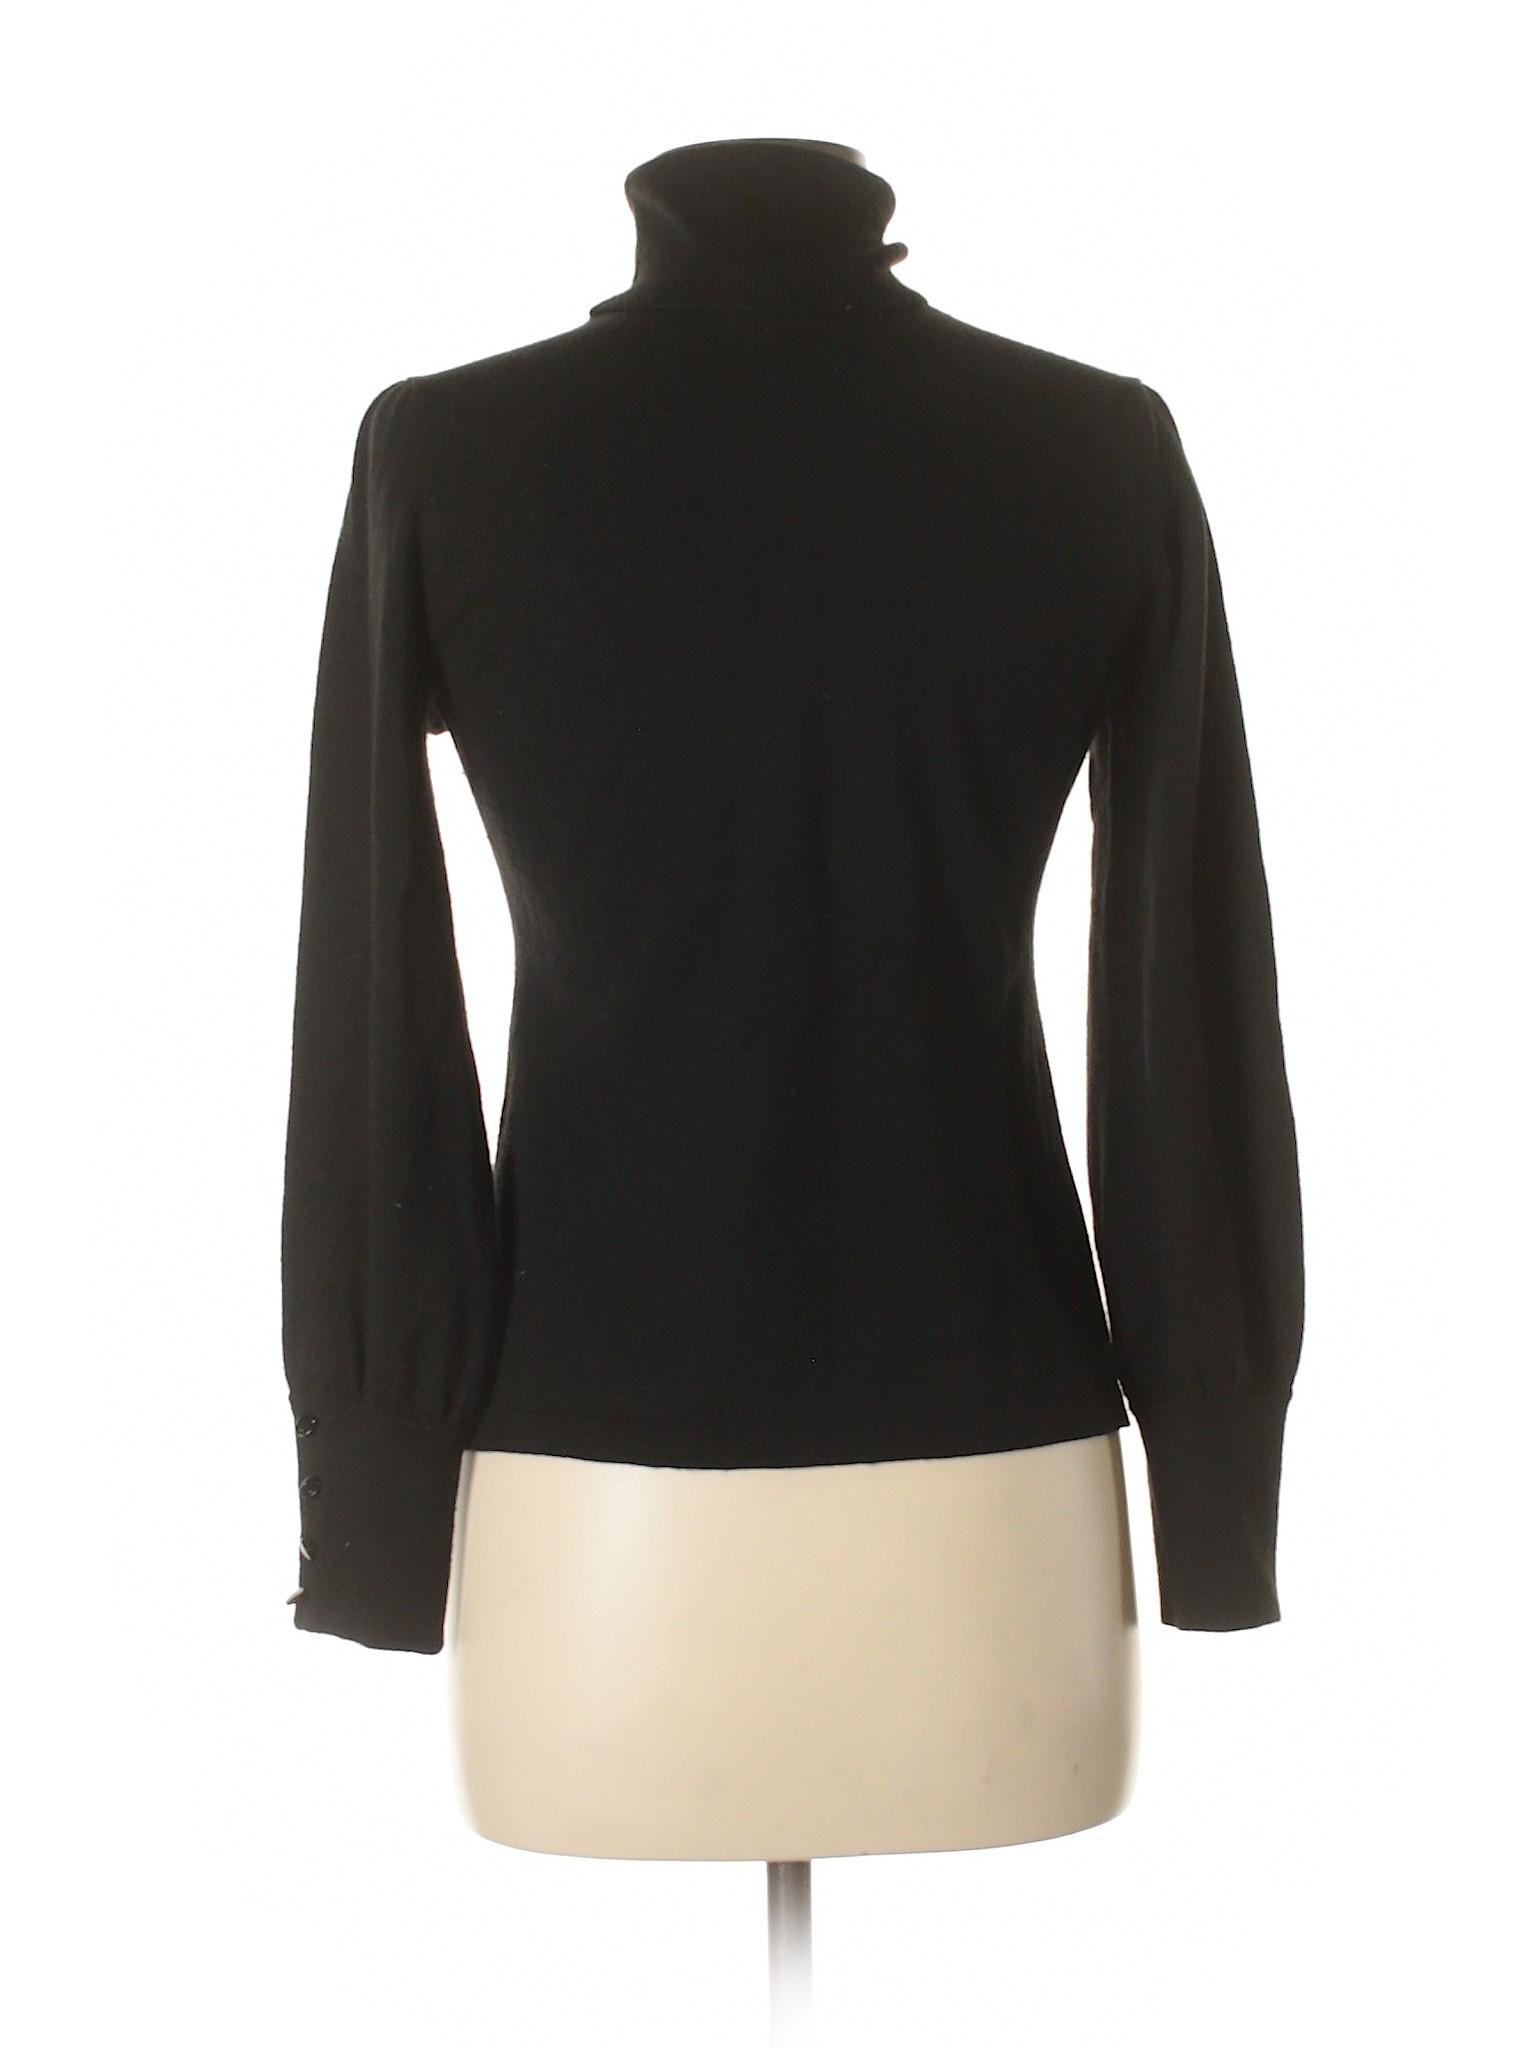 Pullover winter Sweater Ann Taylor Boutique Wool AIZ1xZa